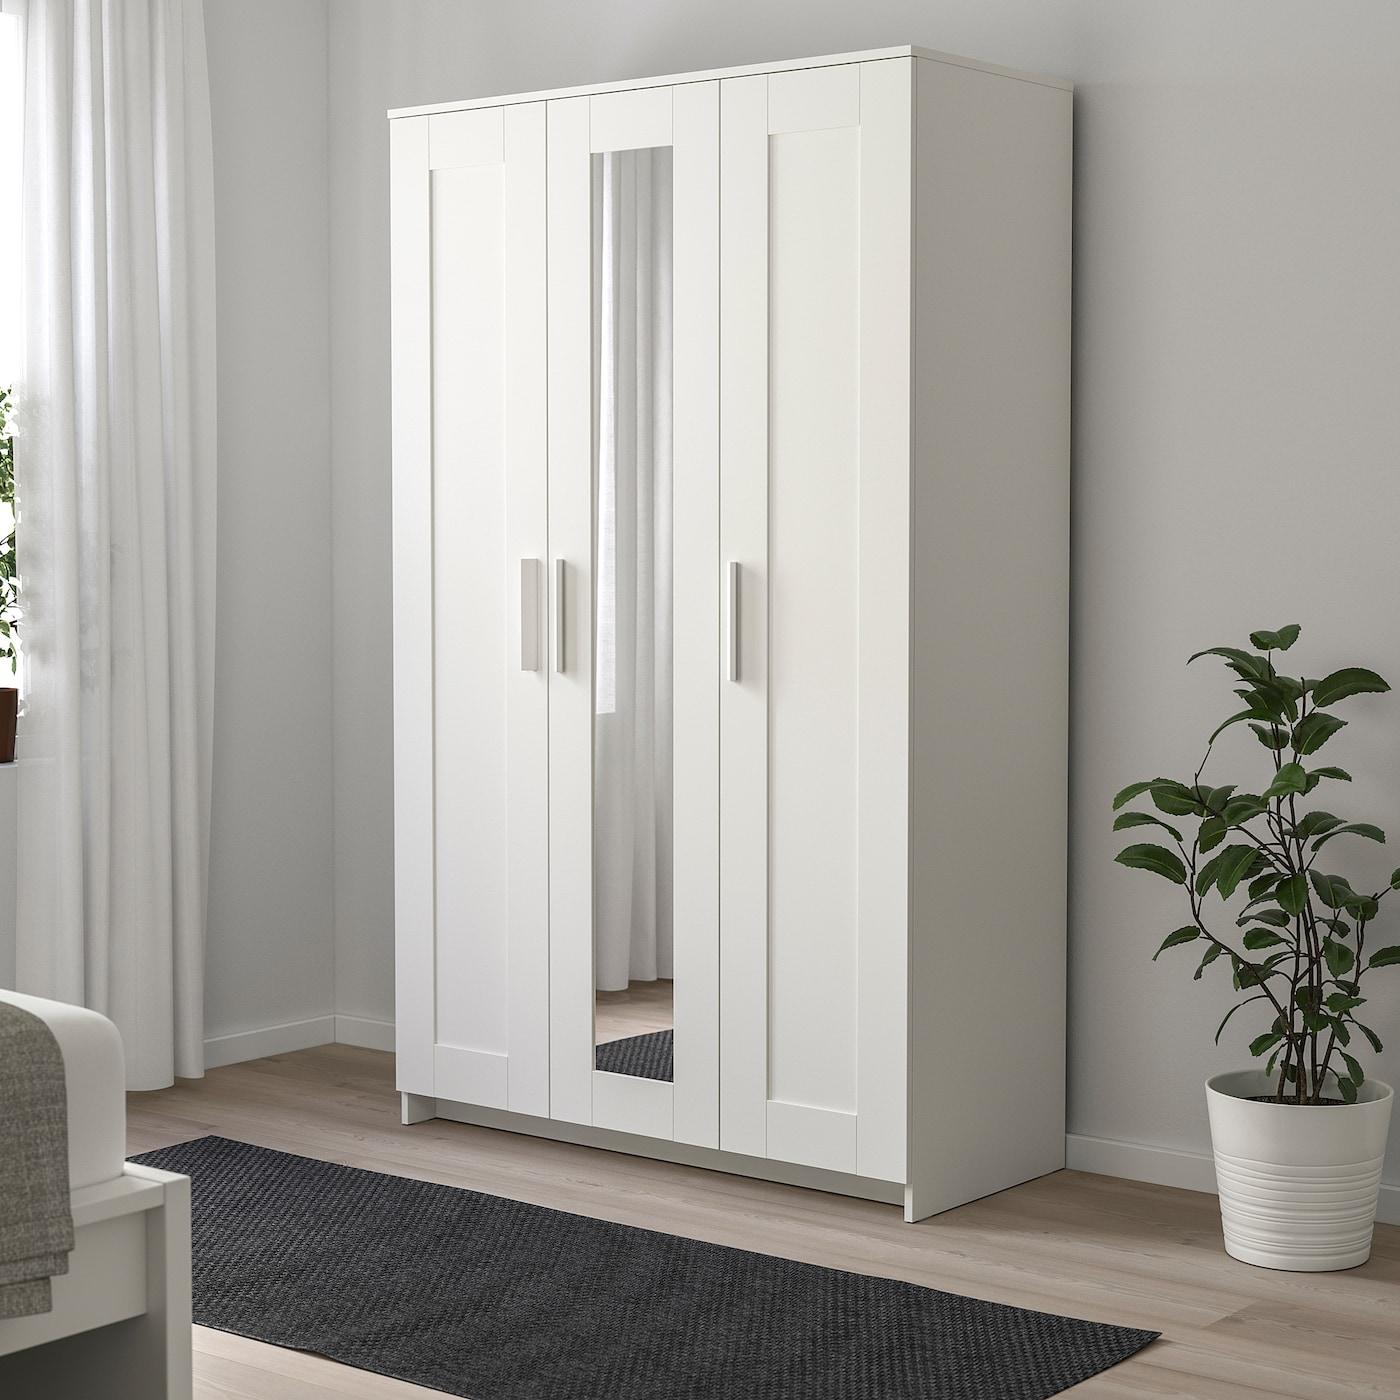 Brimnes Wardrobe With 3 Doors White Ikea Switzerland